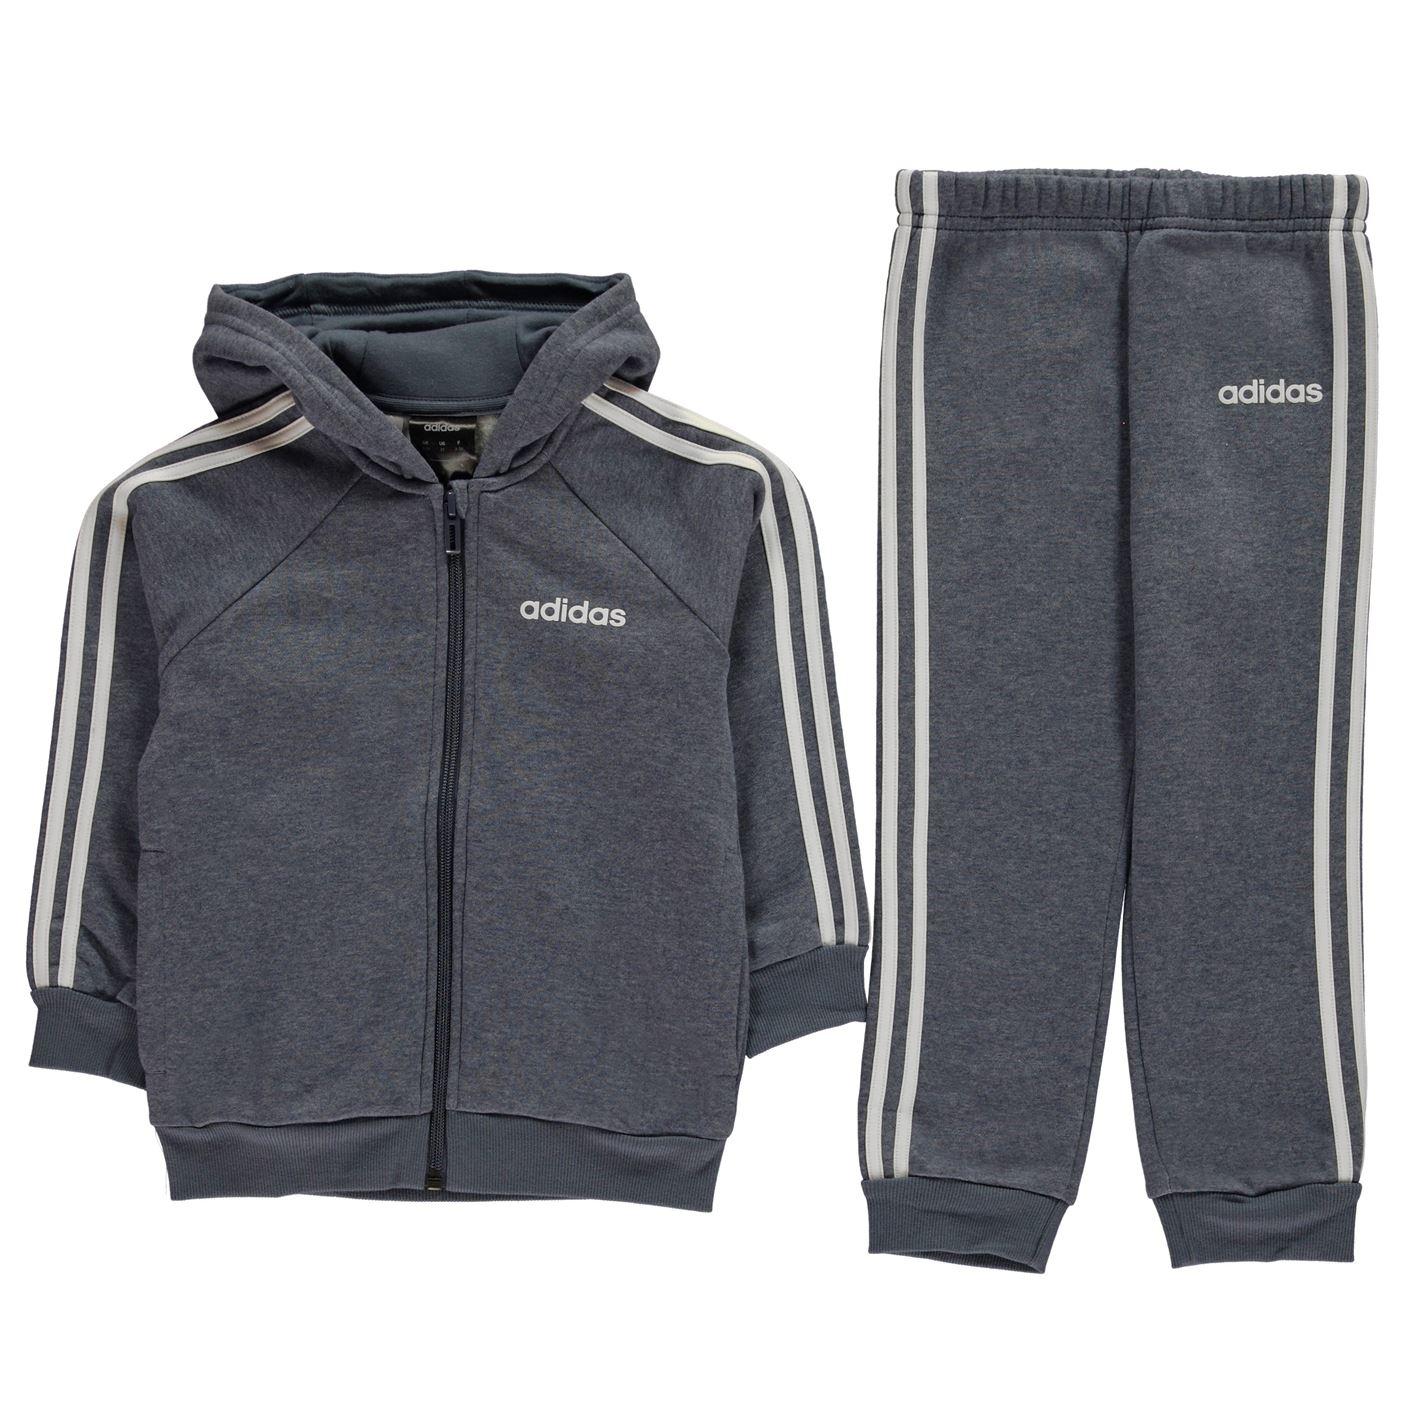 Adidas S3 HD Fleece Tracksuit Infant Boys